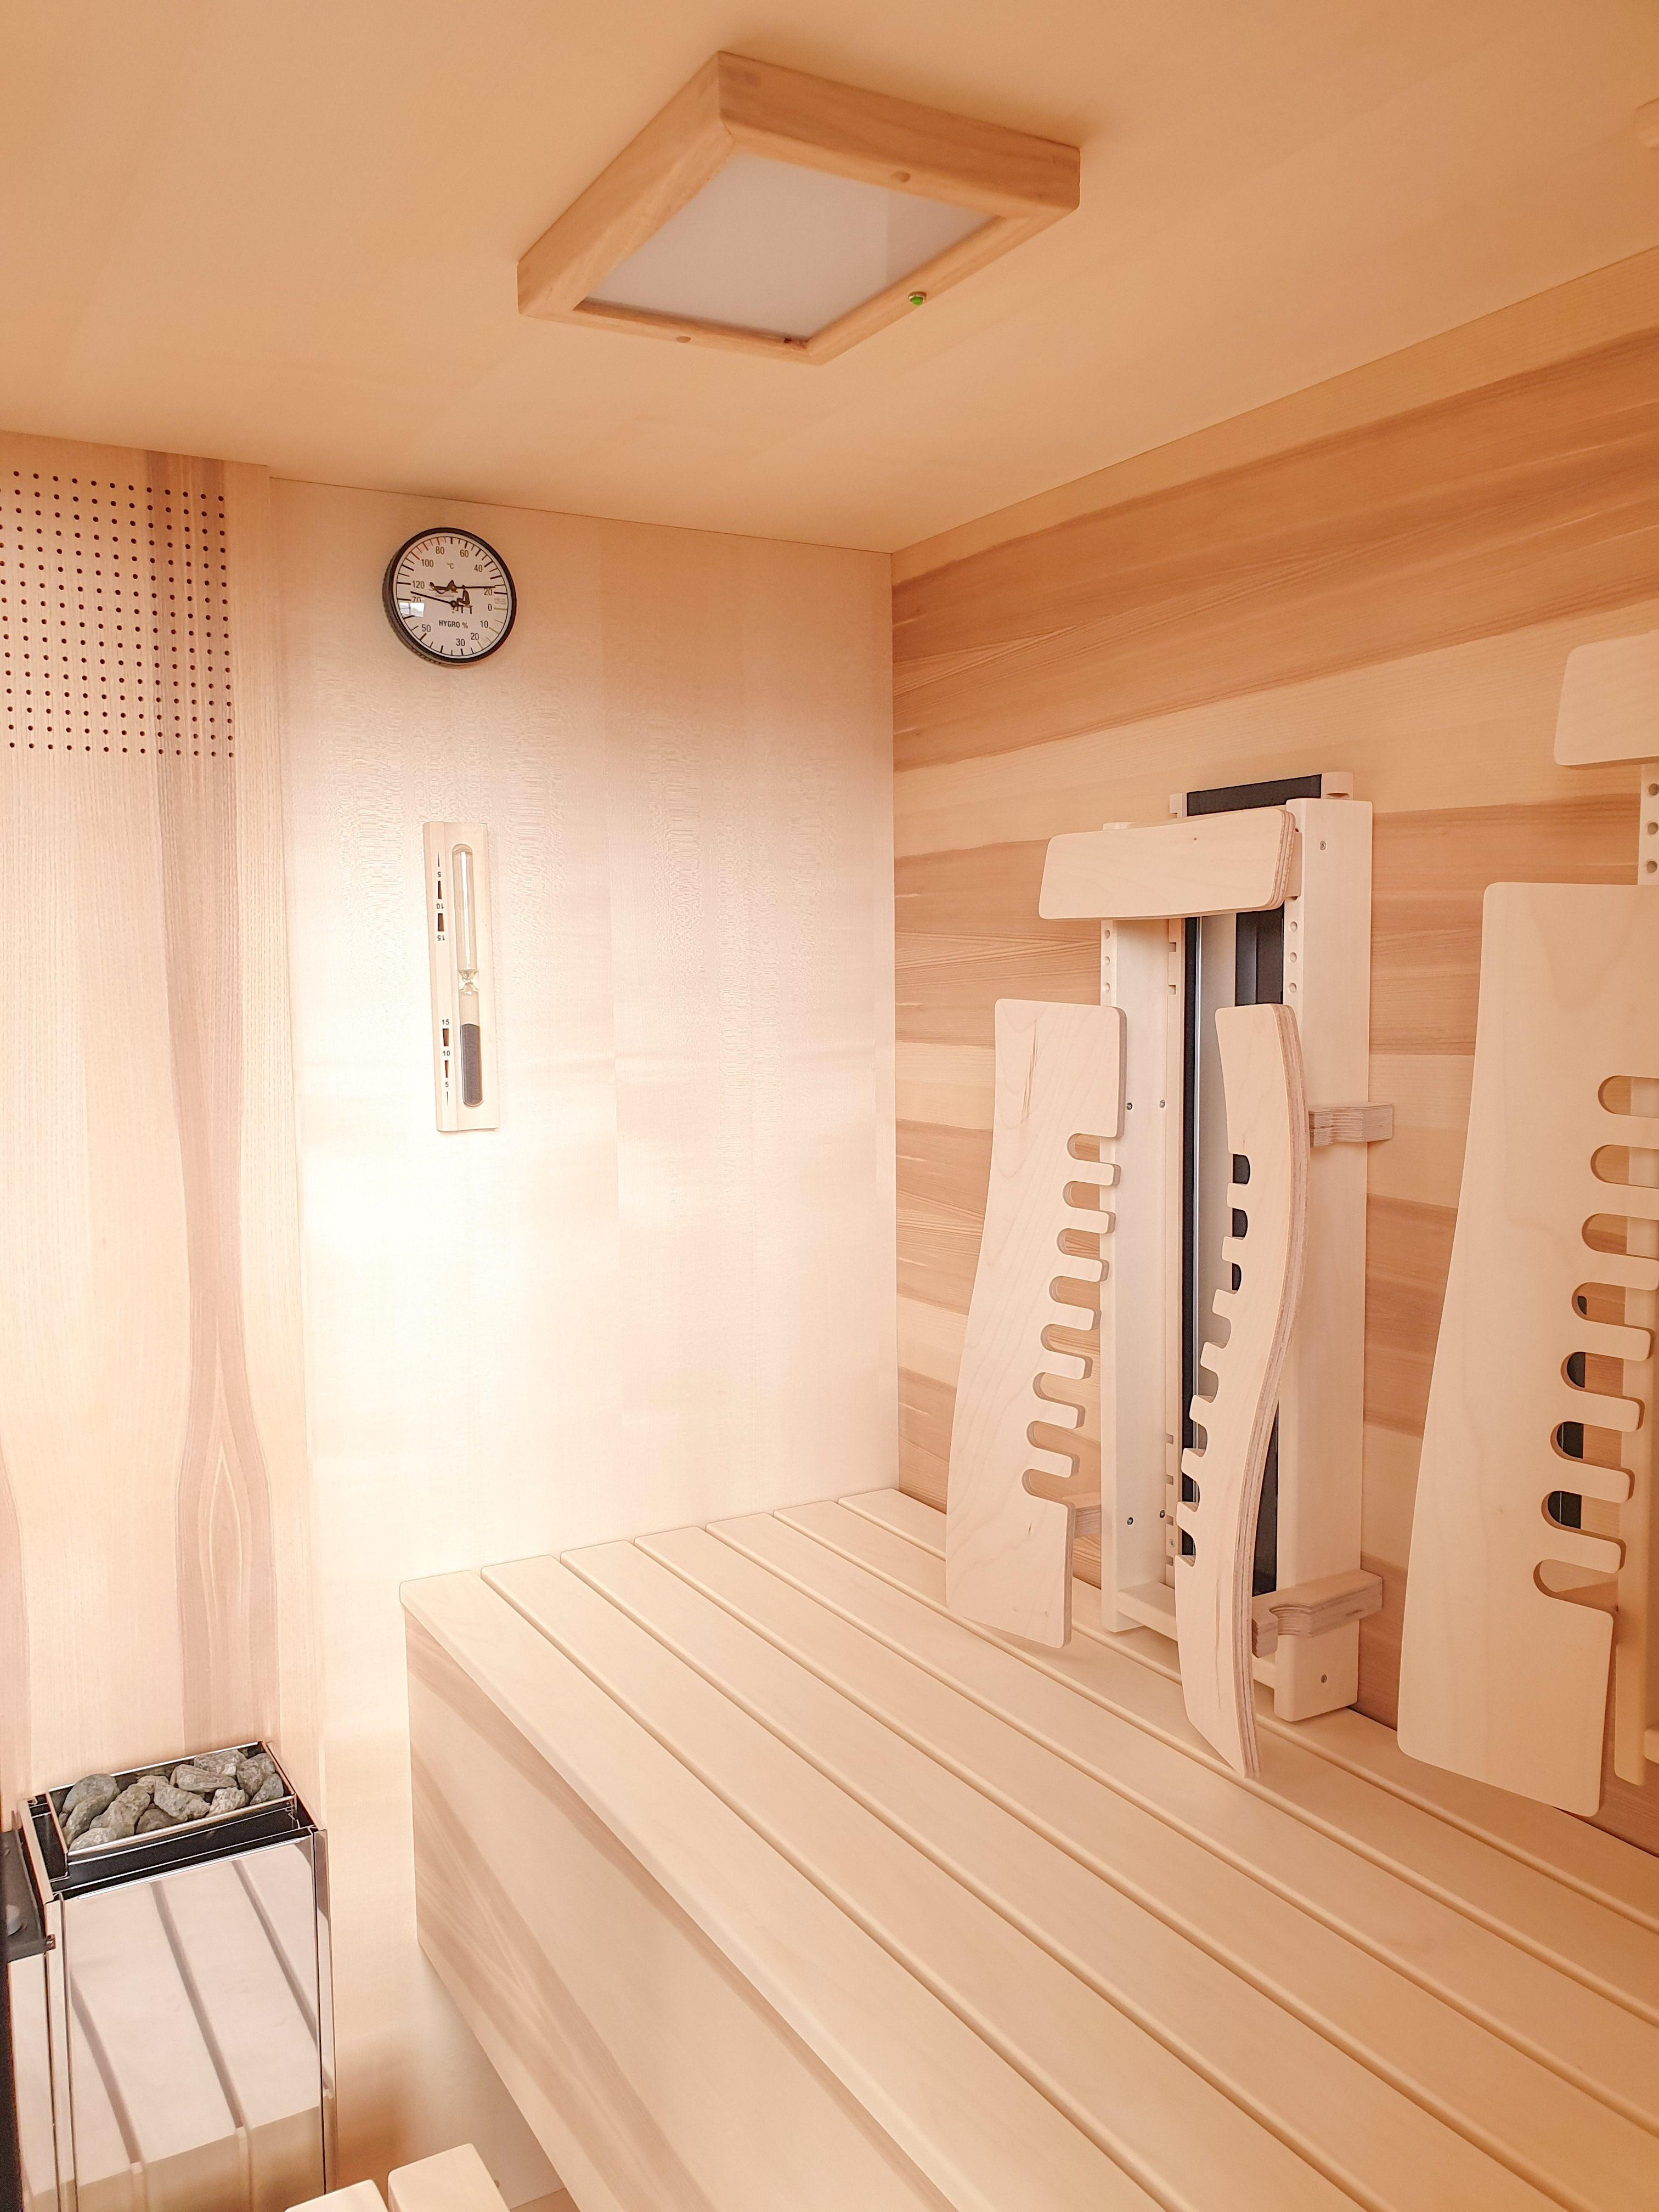 Infrarot Sauna Aus Kernahorn Infrarotkabine Saunaofen Infrarot Sauna